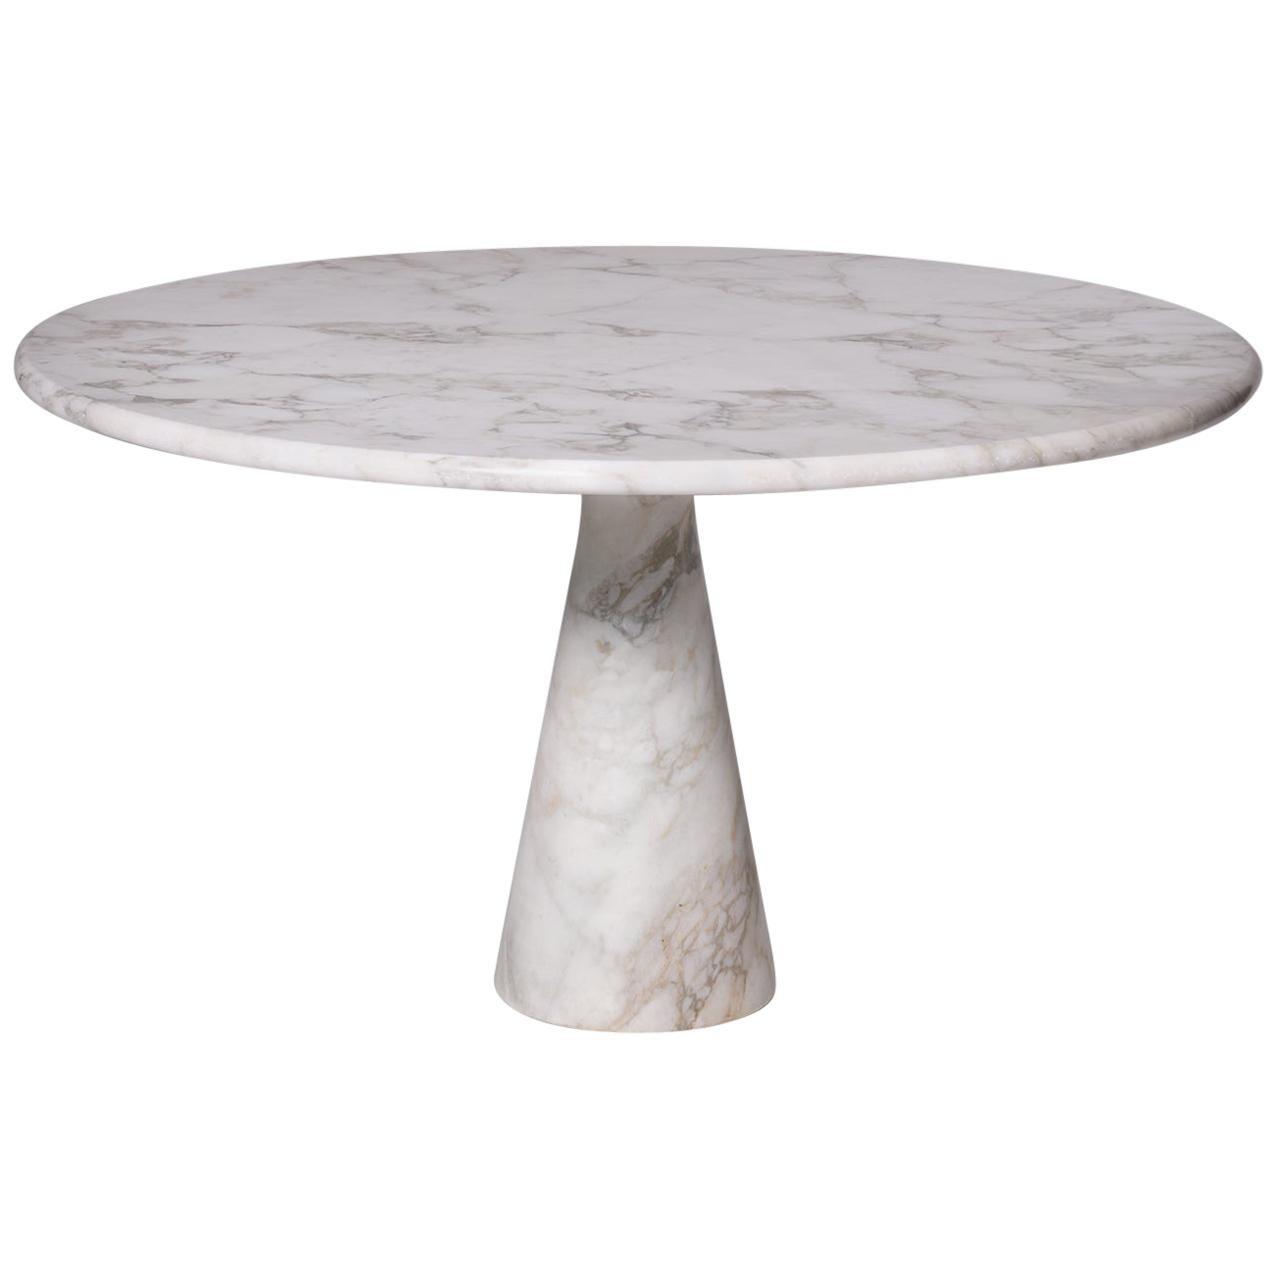 Angelo Mangiarotti 'M1' Dining Table, Italy, 1969